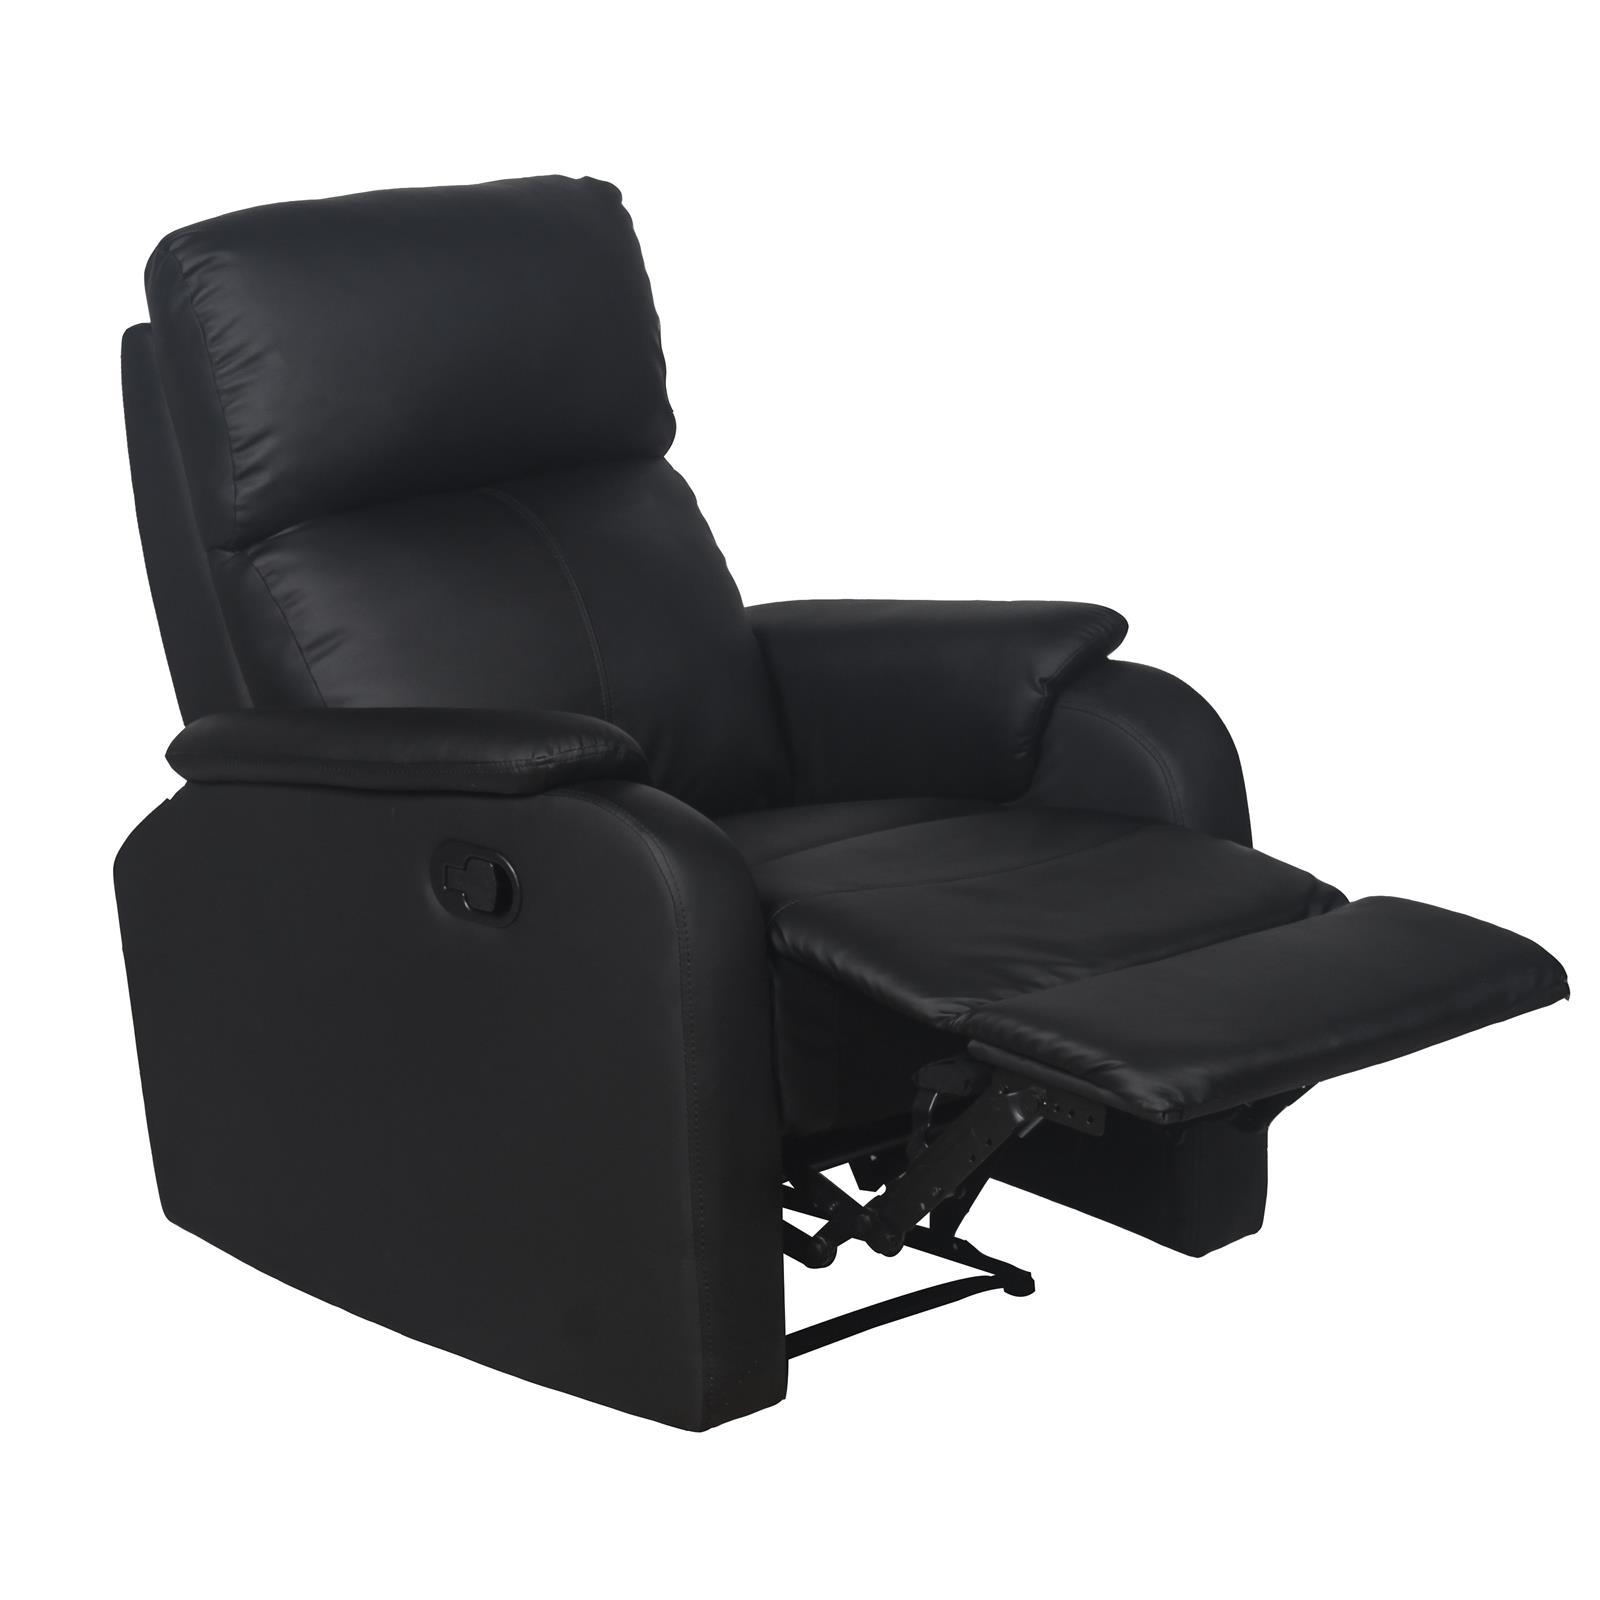 relaxsessel cozy in schwarz caro m bel. Black Bedroom Furniture Sets. Home Design Ideas